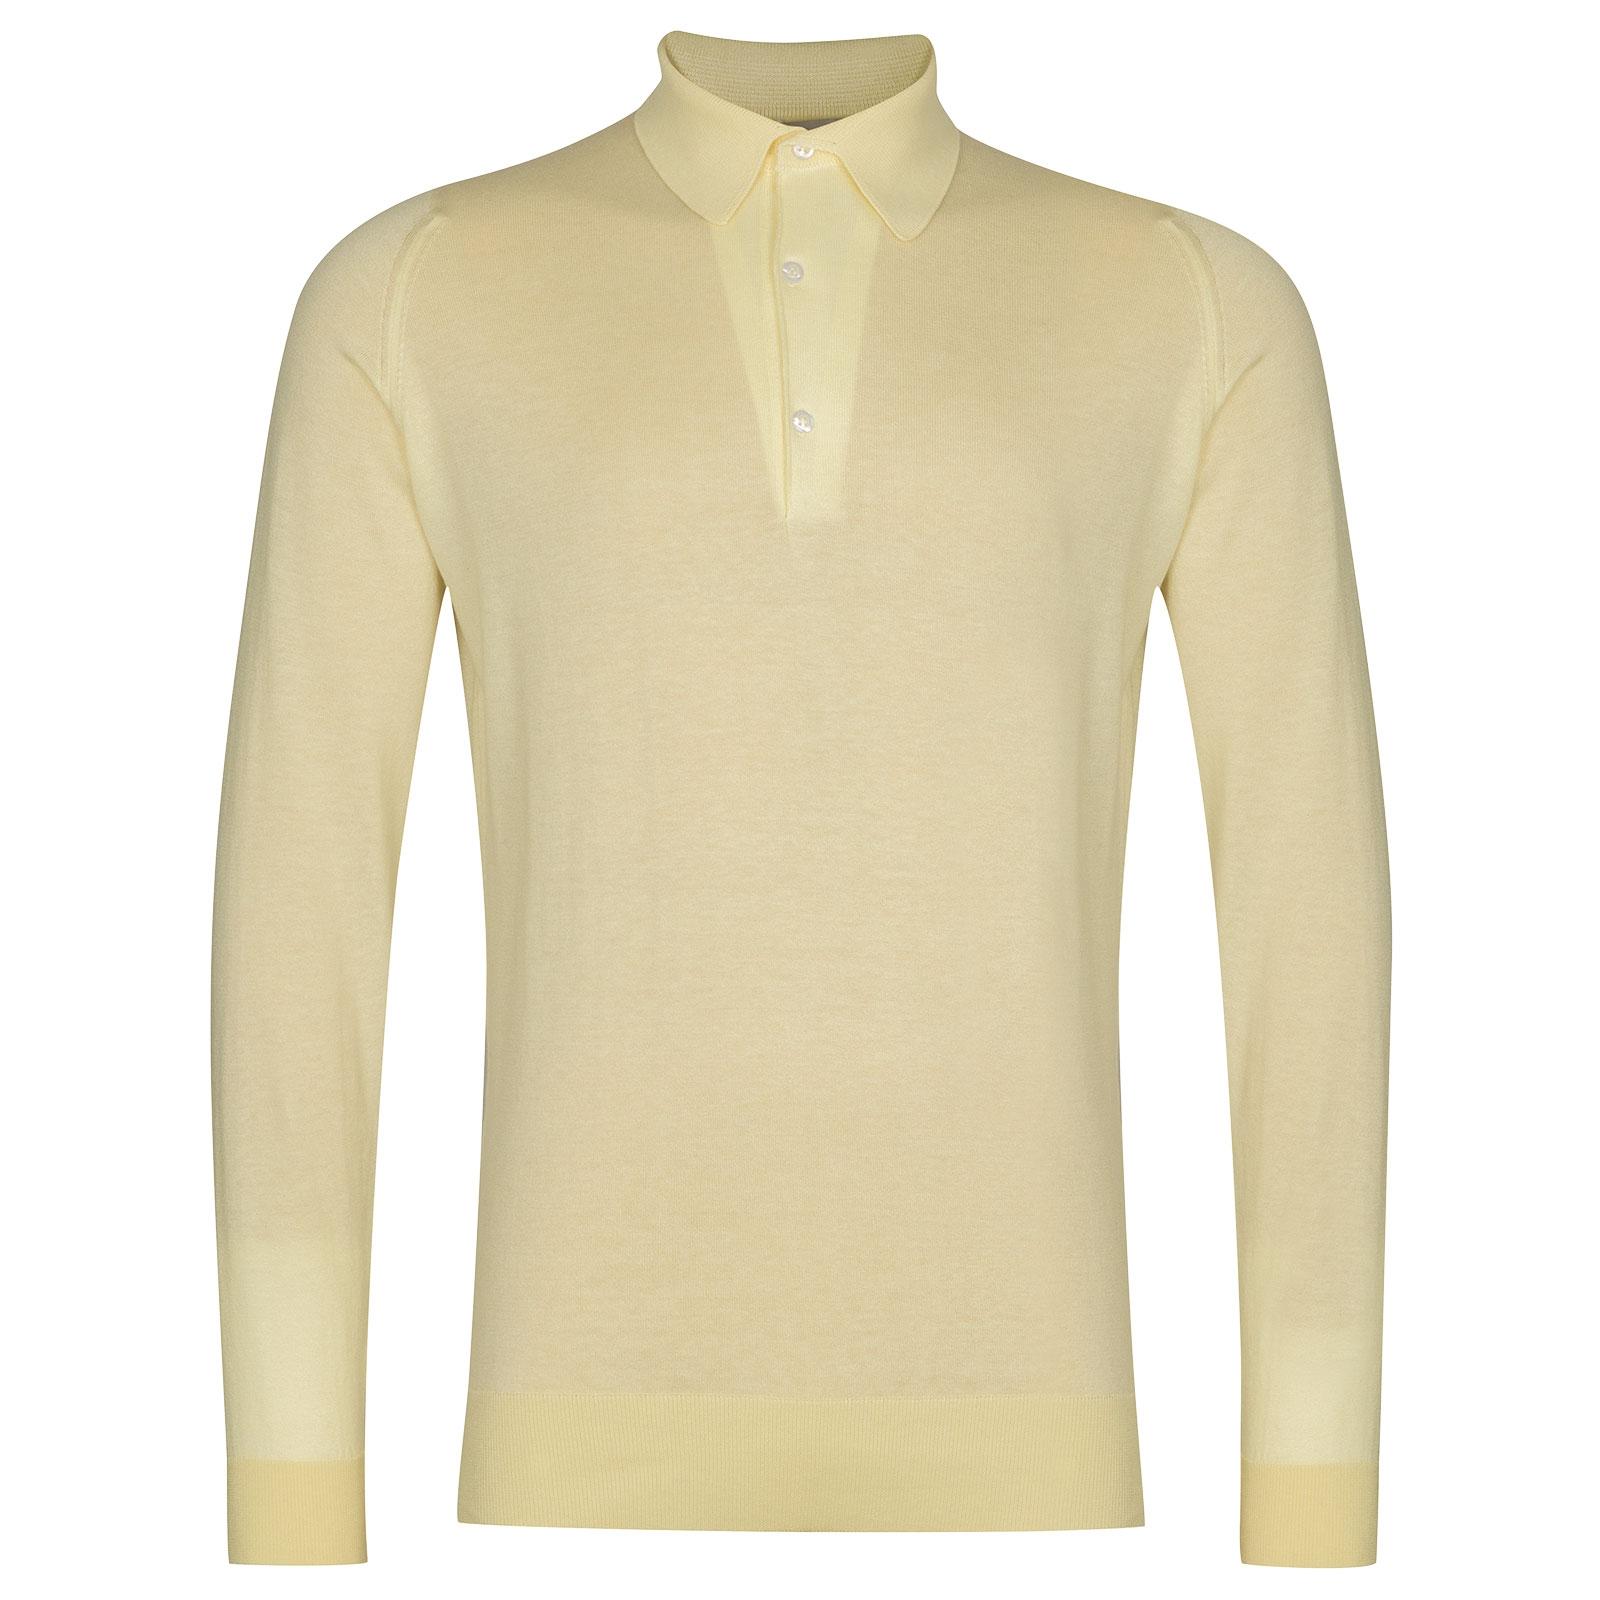 John Smedley Lanlay in Lemon White Shirt-LGE